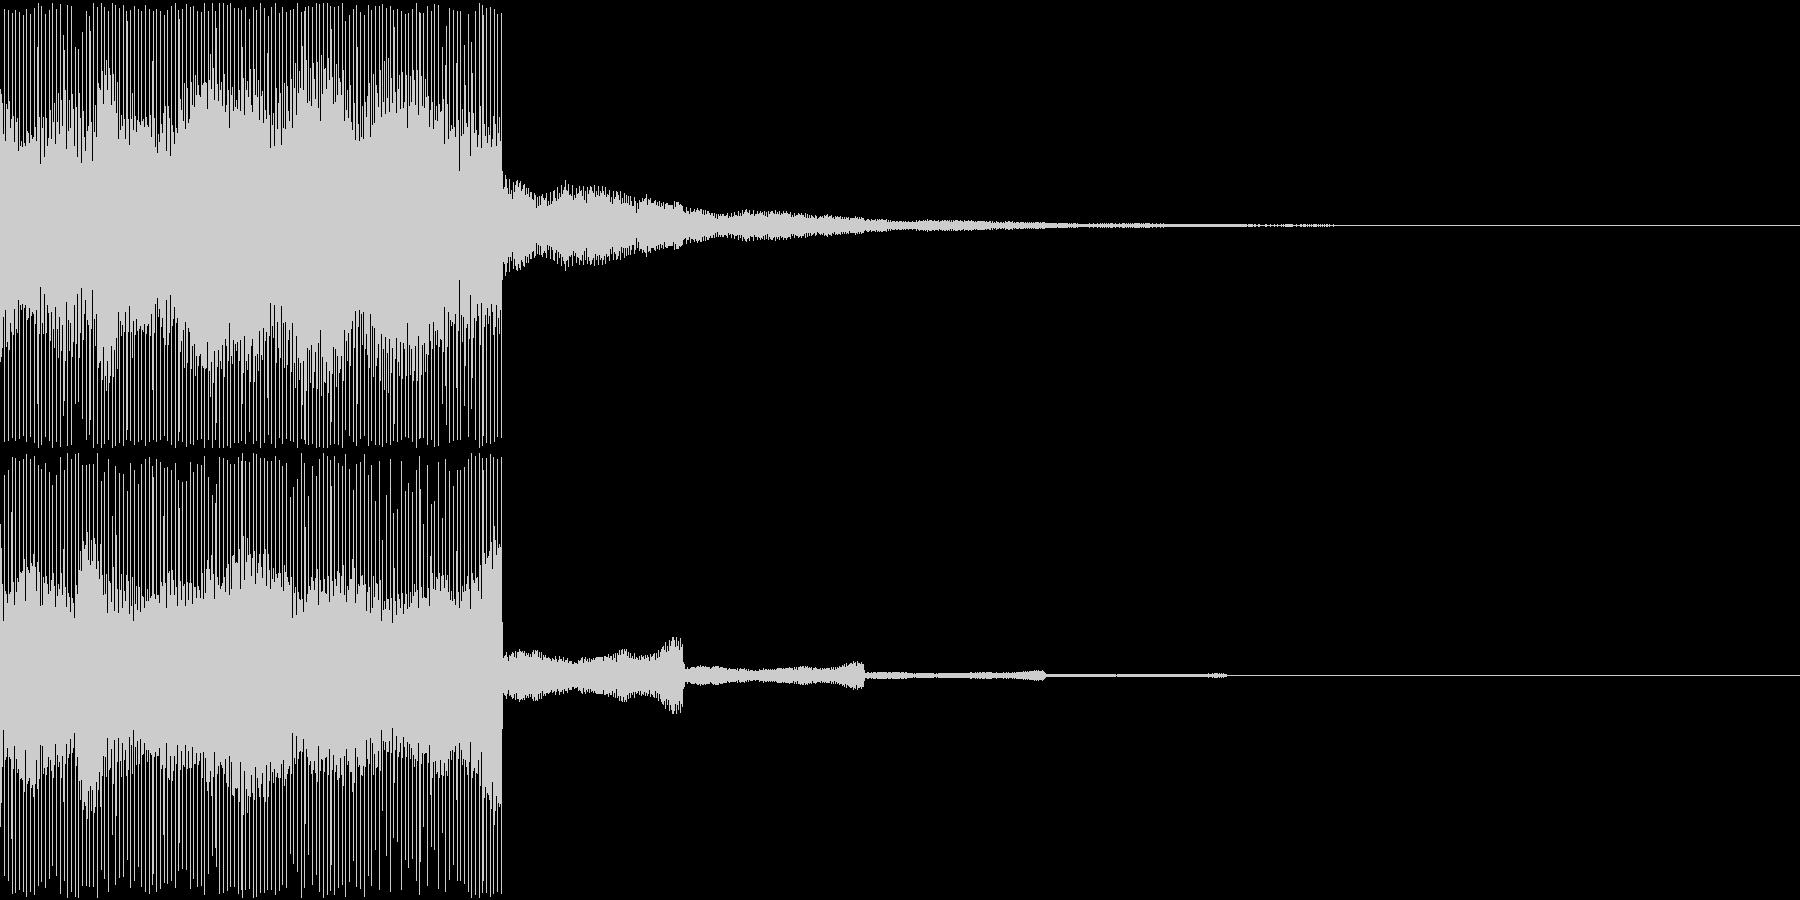 【SE 効果音】電気音の未再生の波形